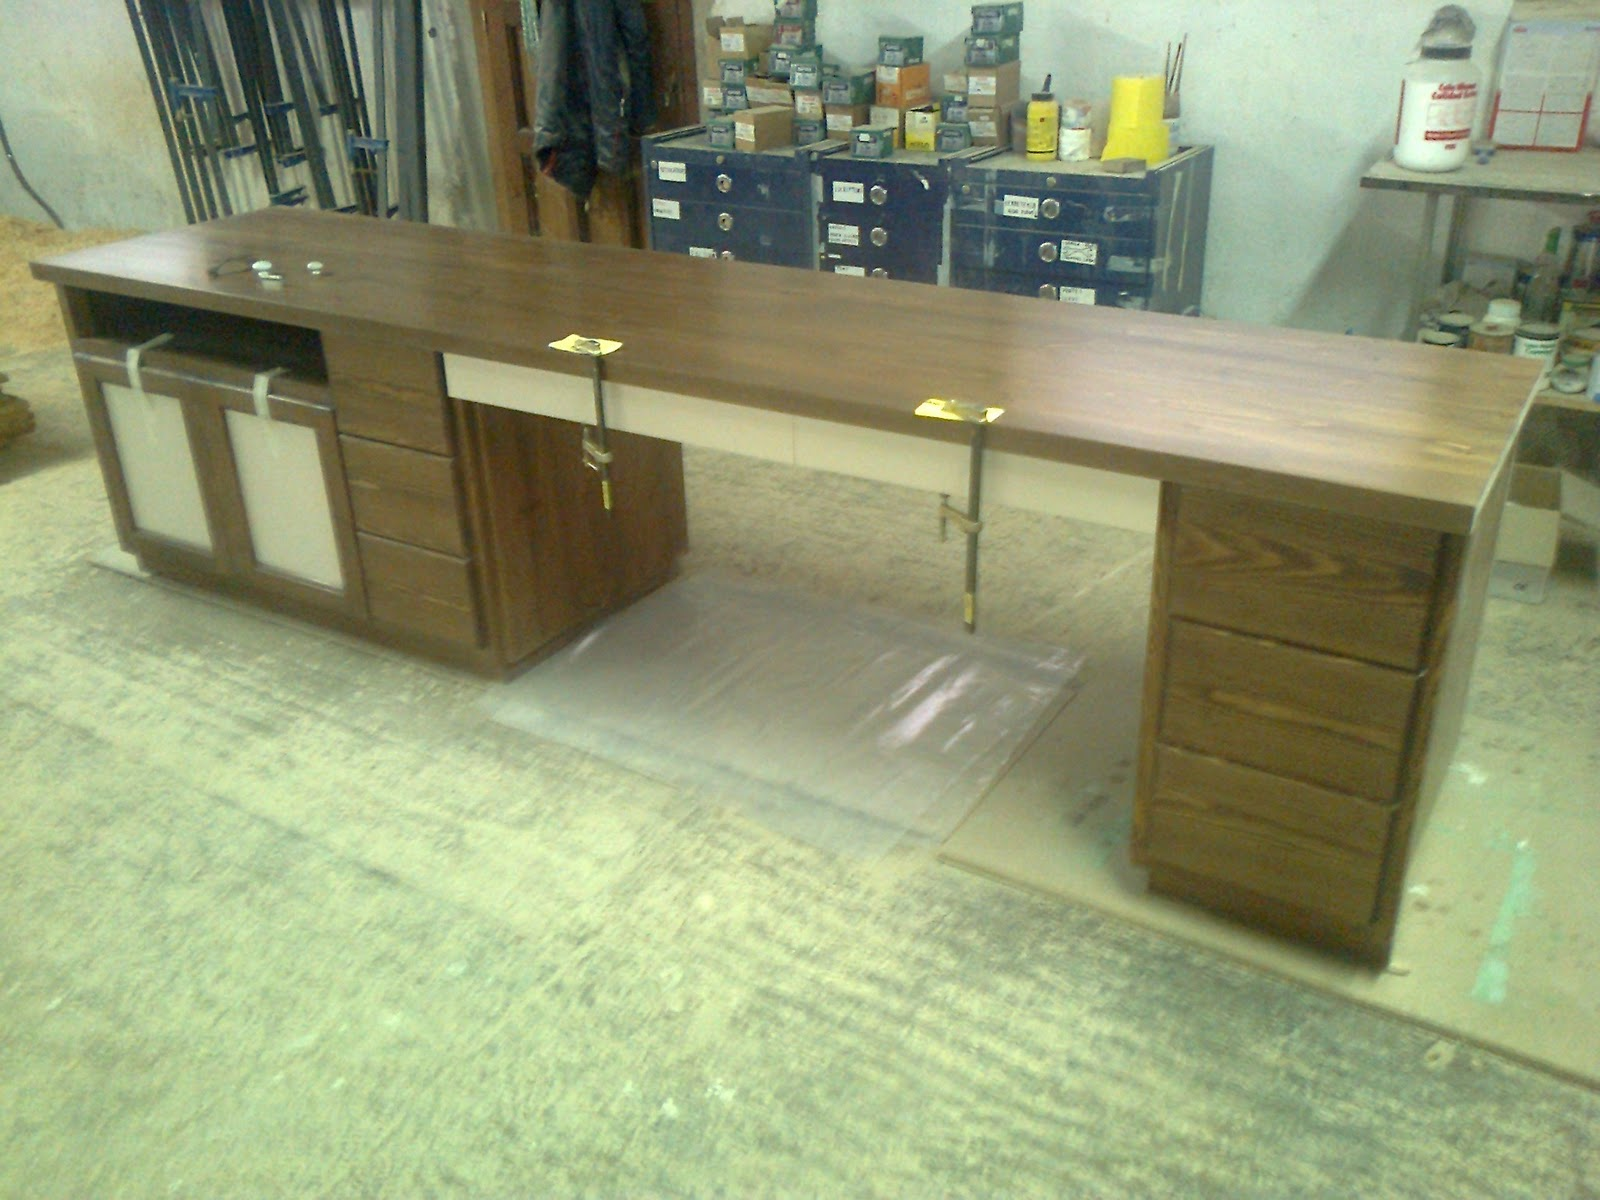 Mi las mobles moble escriptori de fusta a mida - Mobles vintage barcelona ...